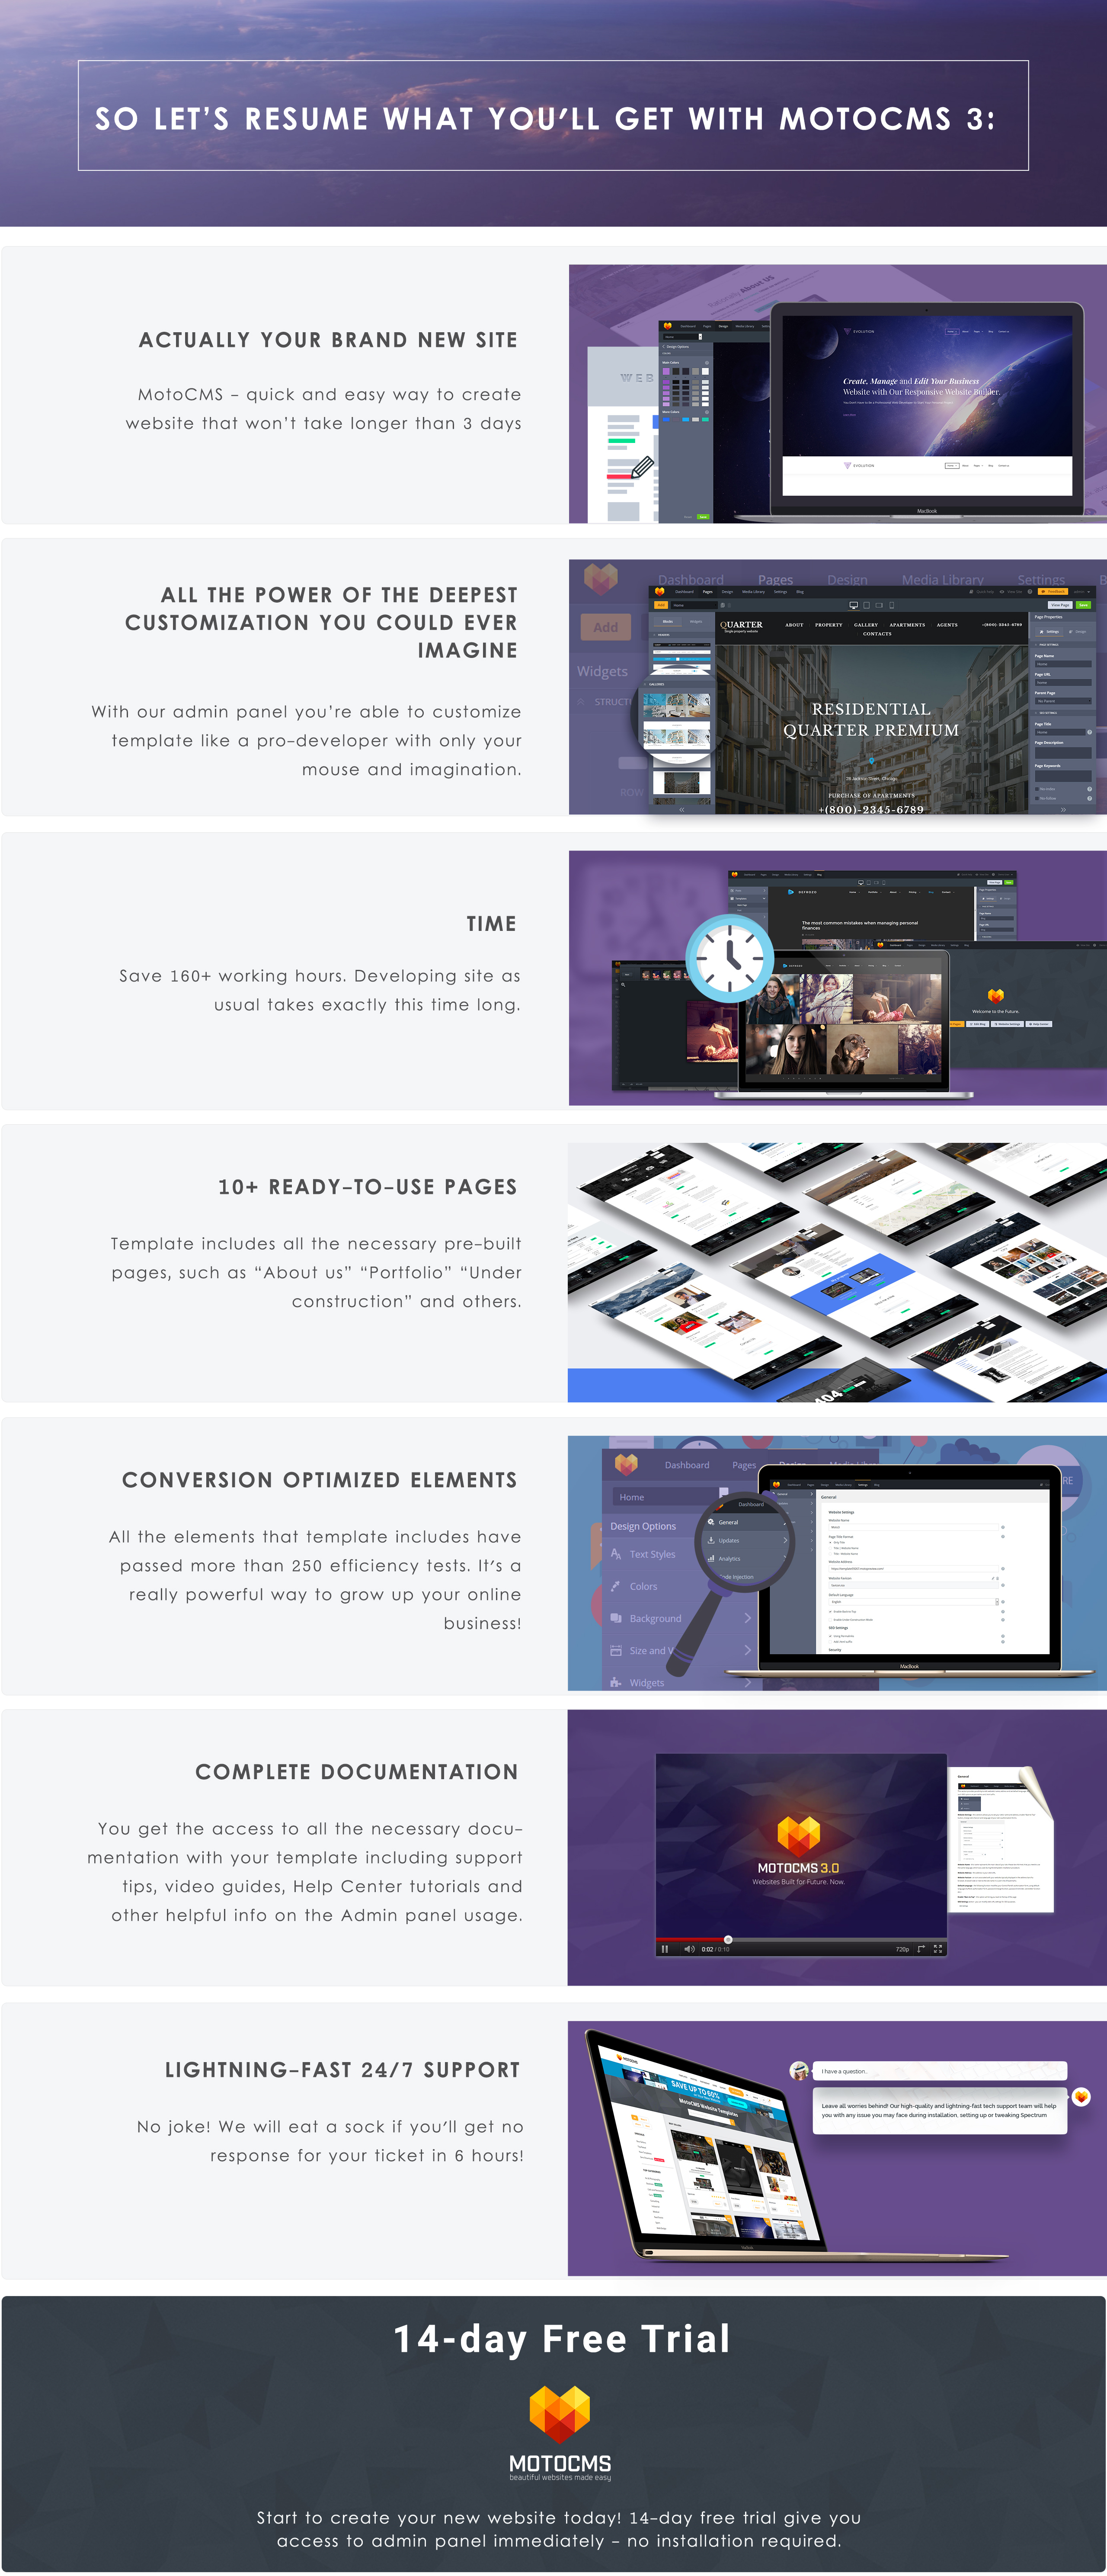 DePaletra - Design Studio Moto CMS 3 Template